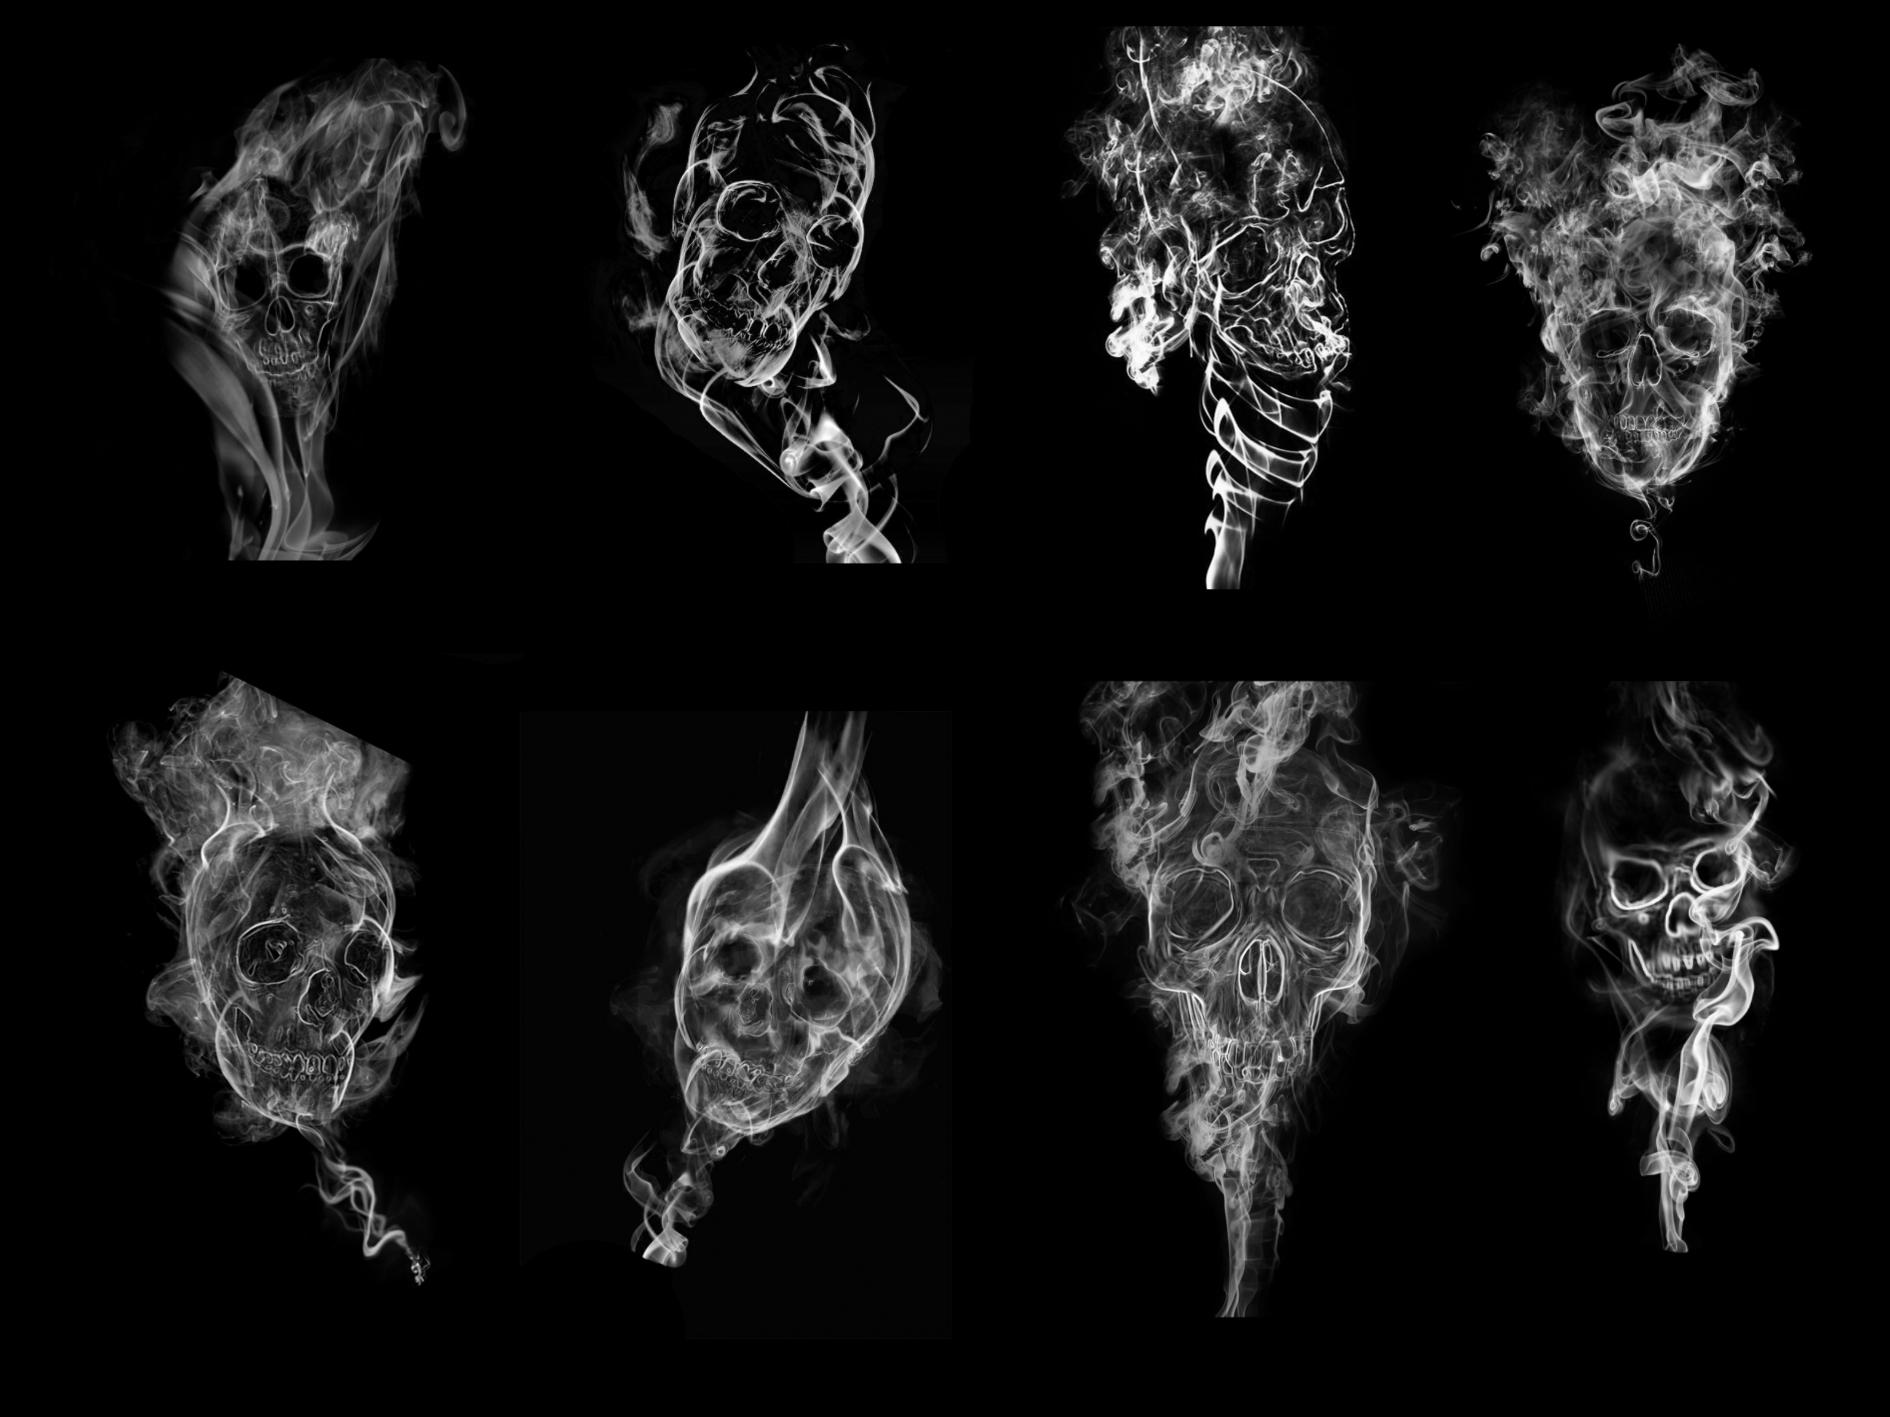 Smoke skull brushes by Loverboy89 on DeviantArt